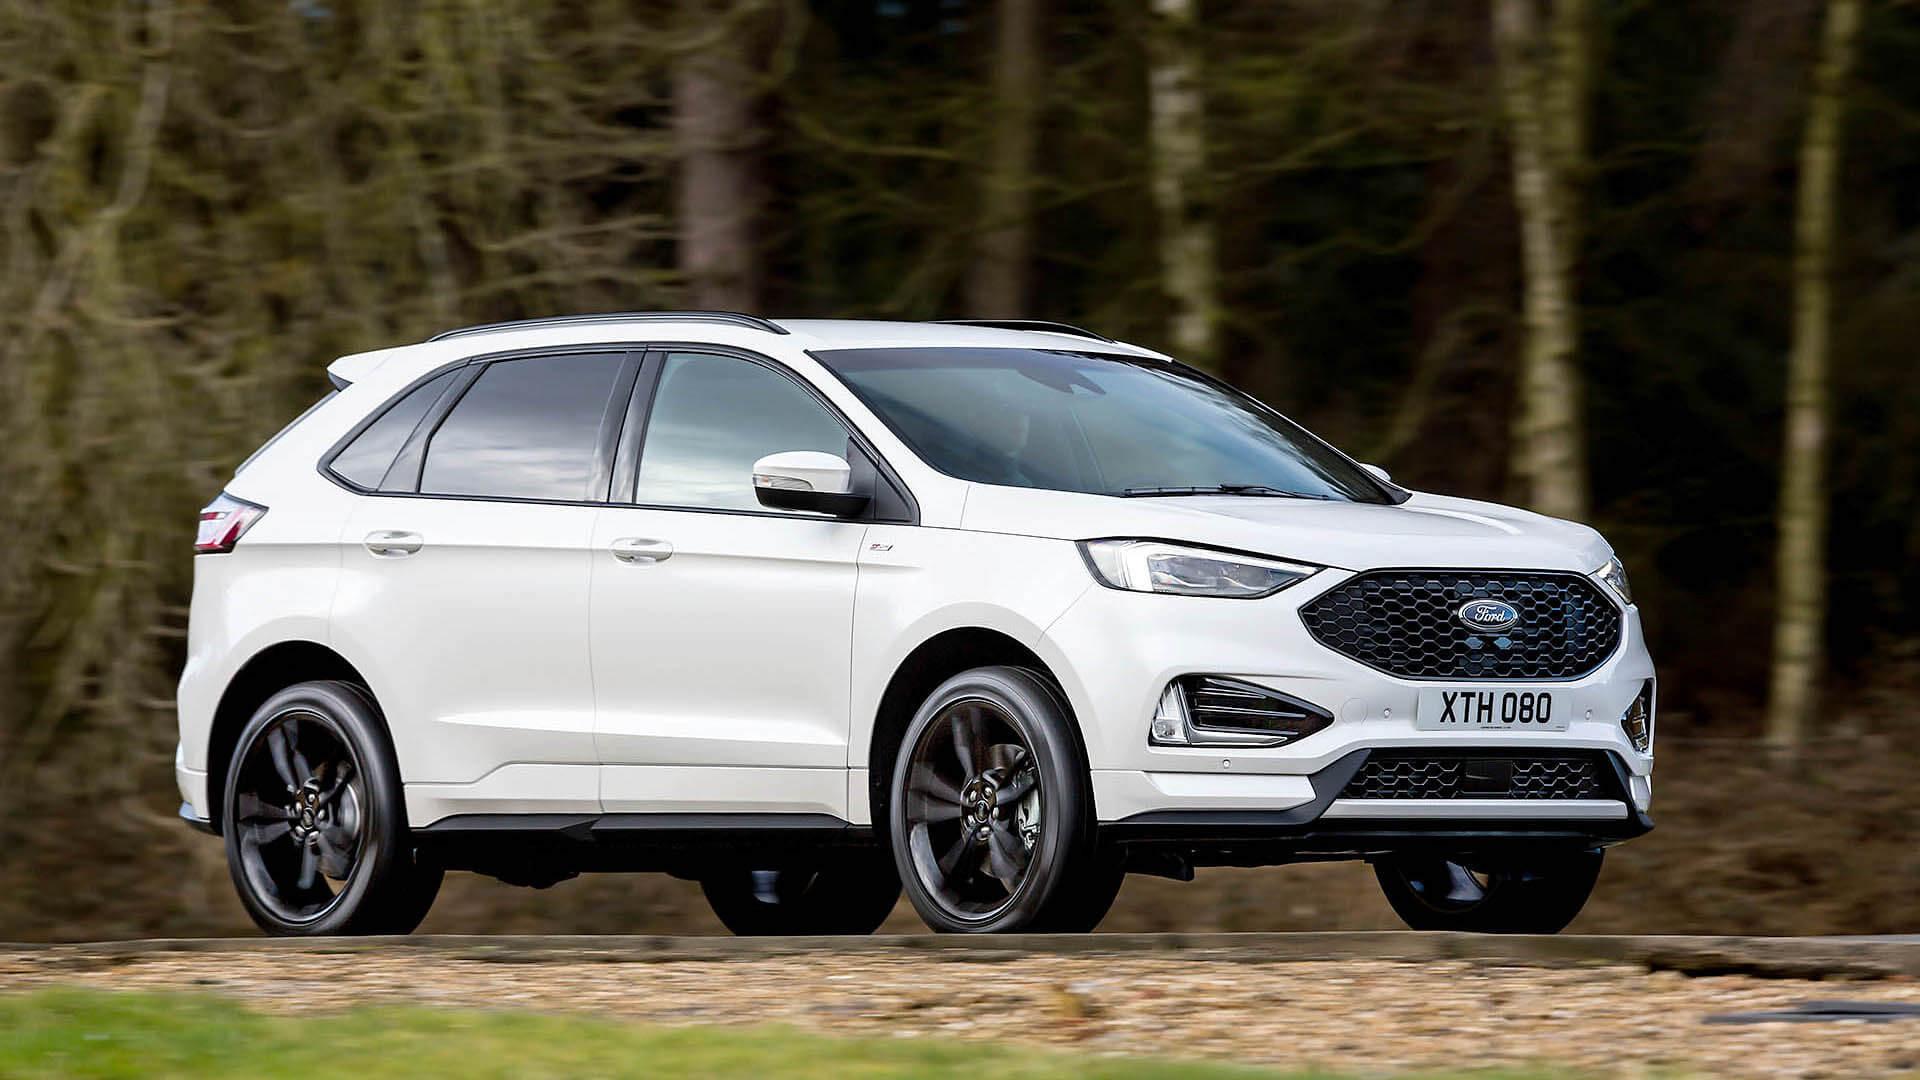 Neues Ford-SUV soll noch 11 starten | ford suv